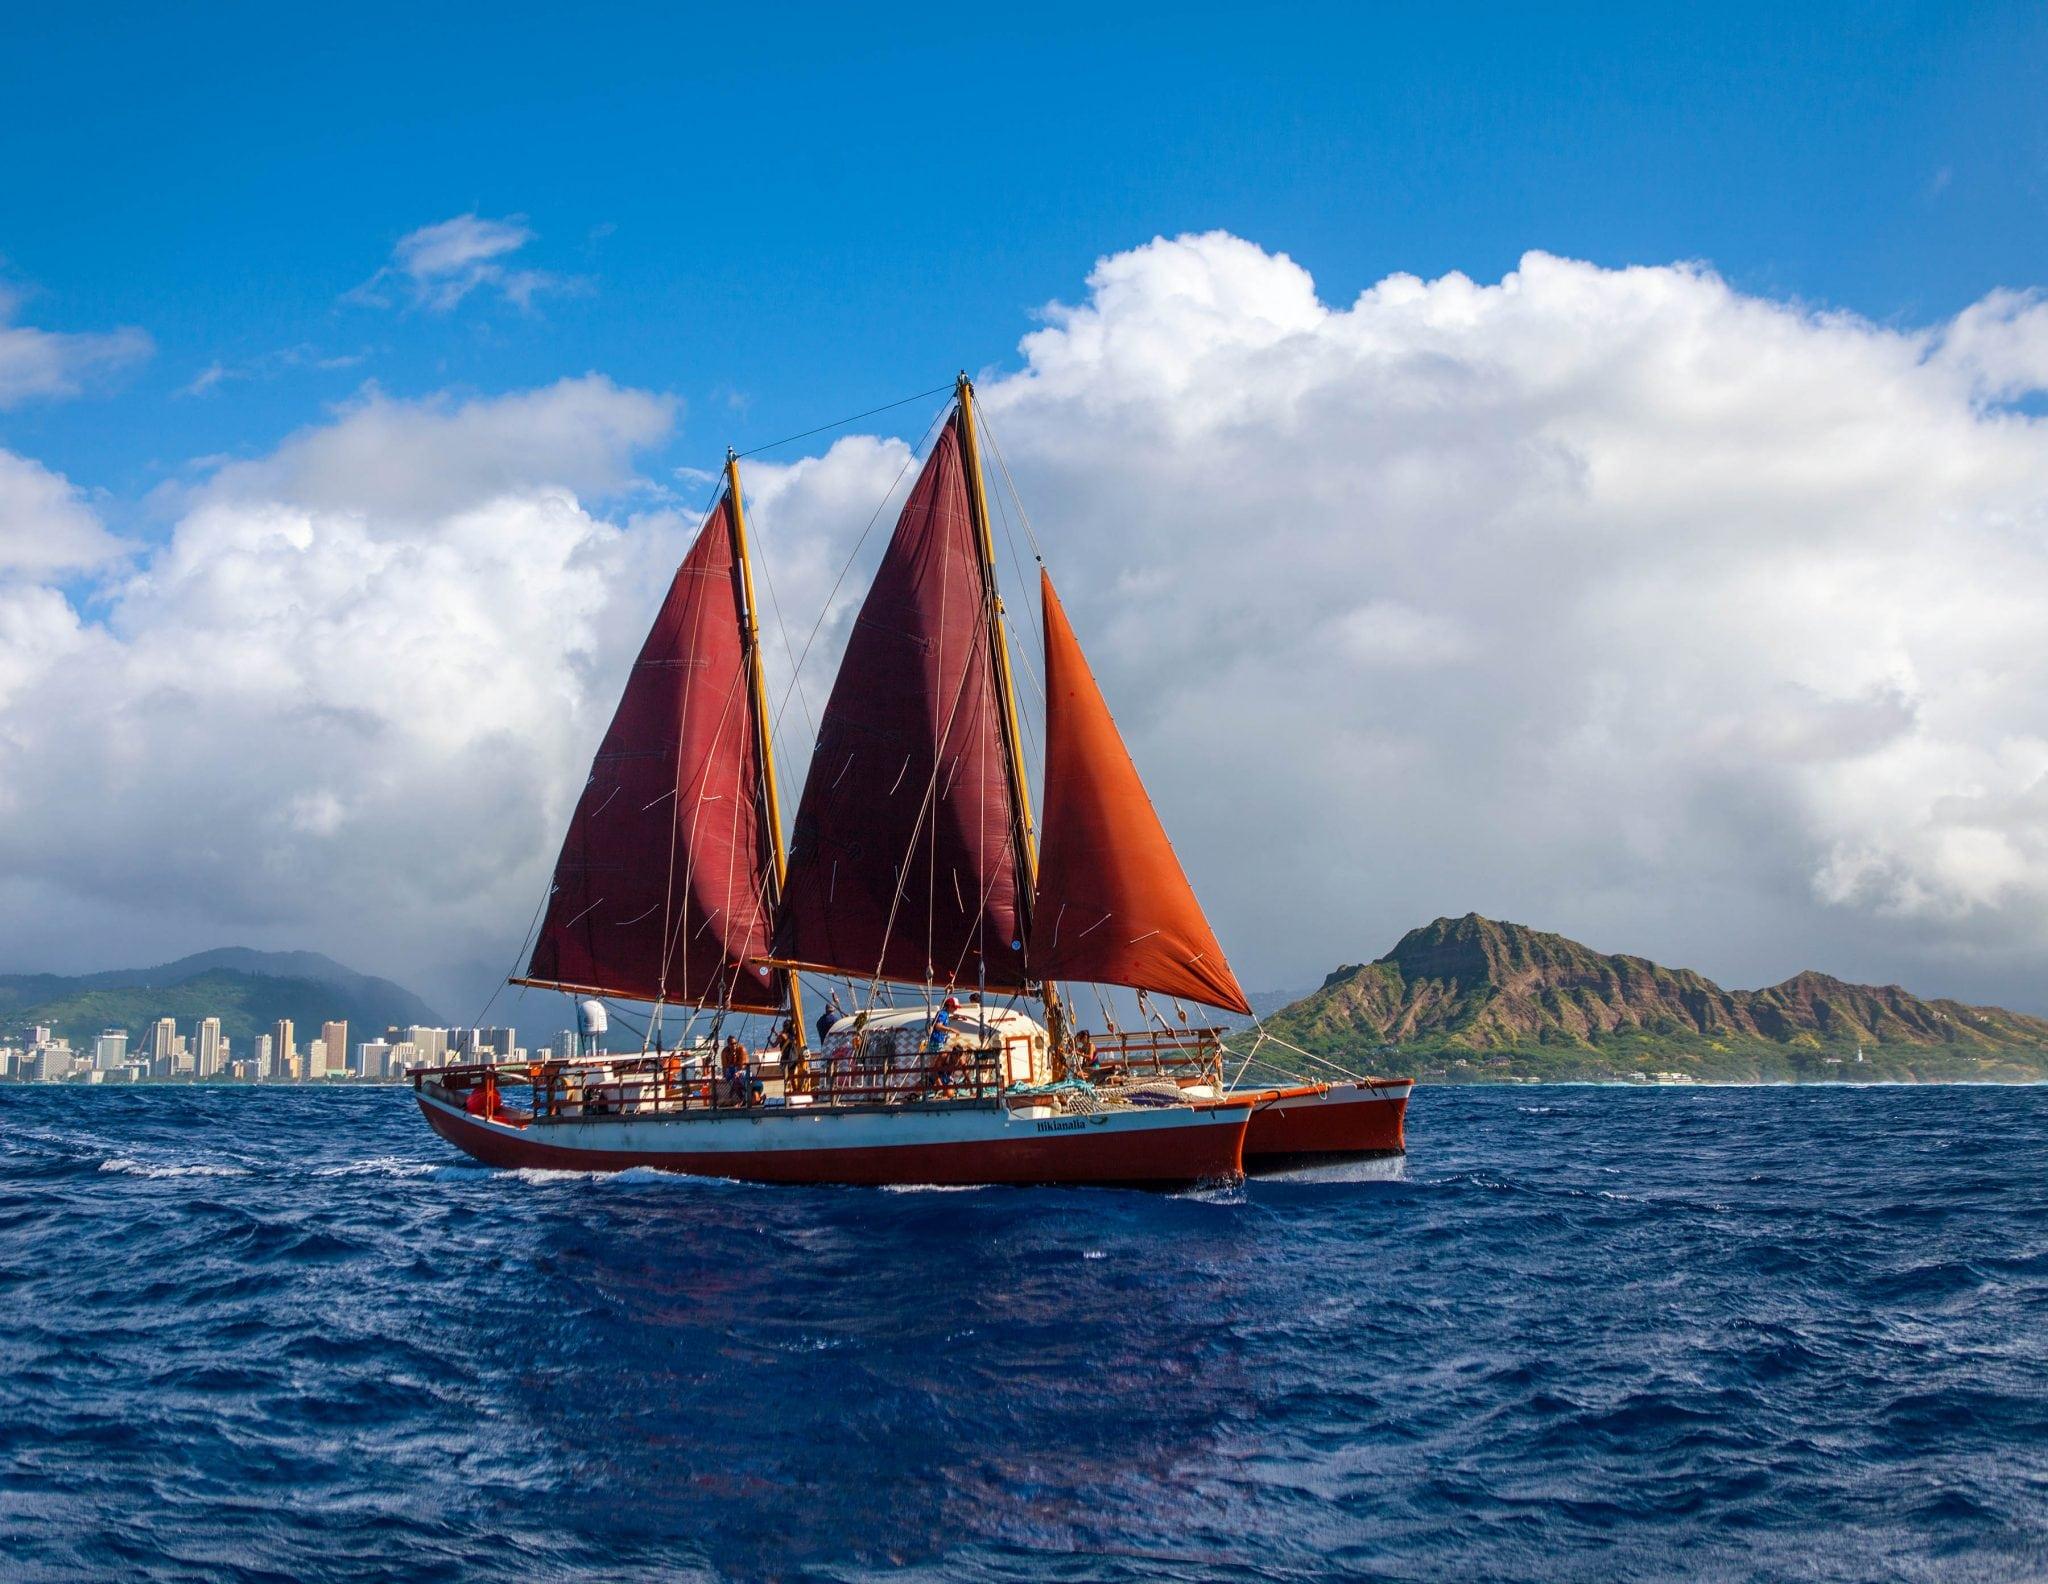 Polynesian Voyaging Canoe Visits Ventura Harbor Village